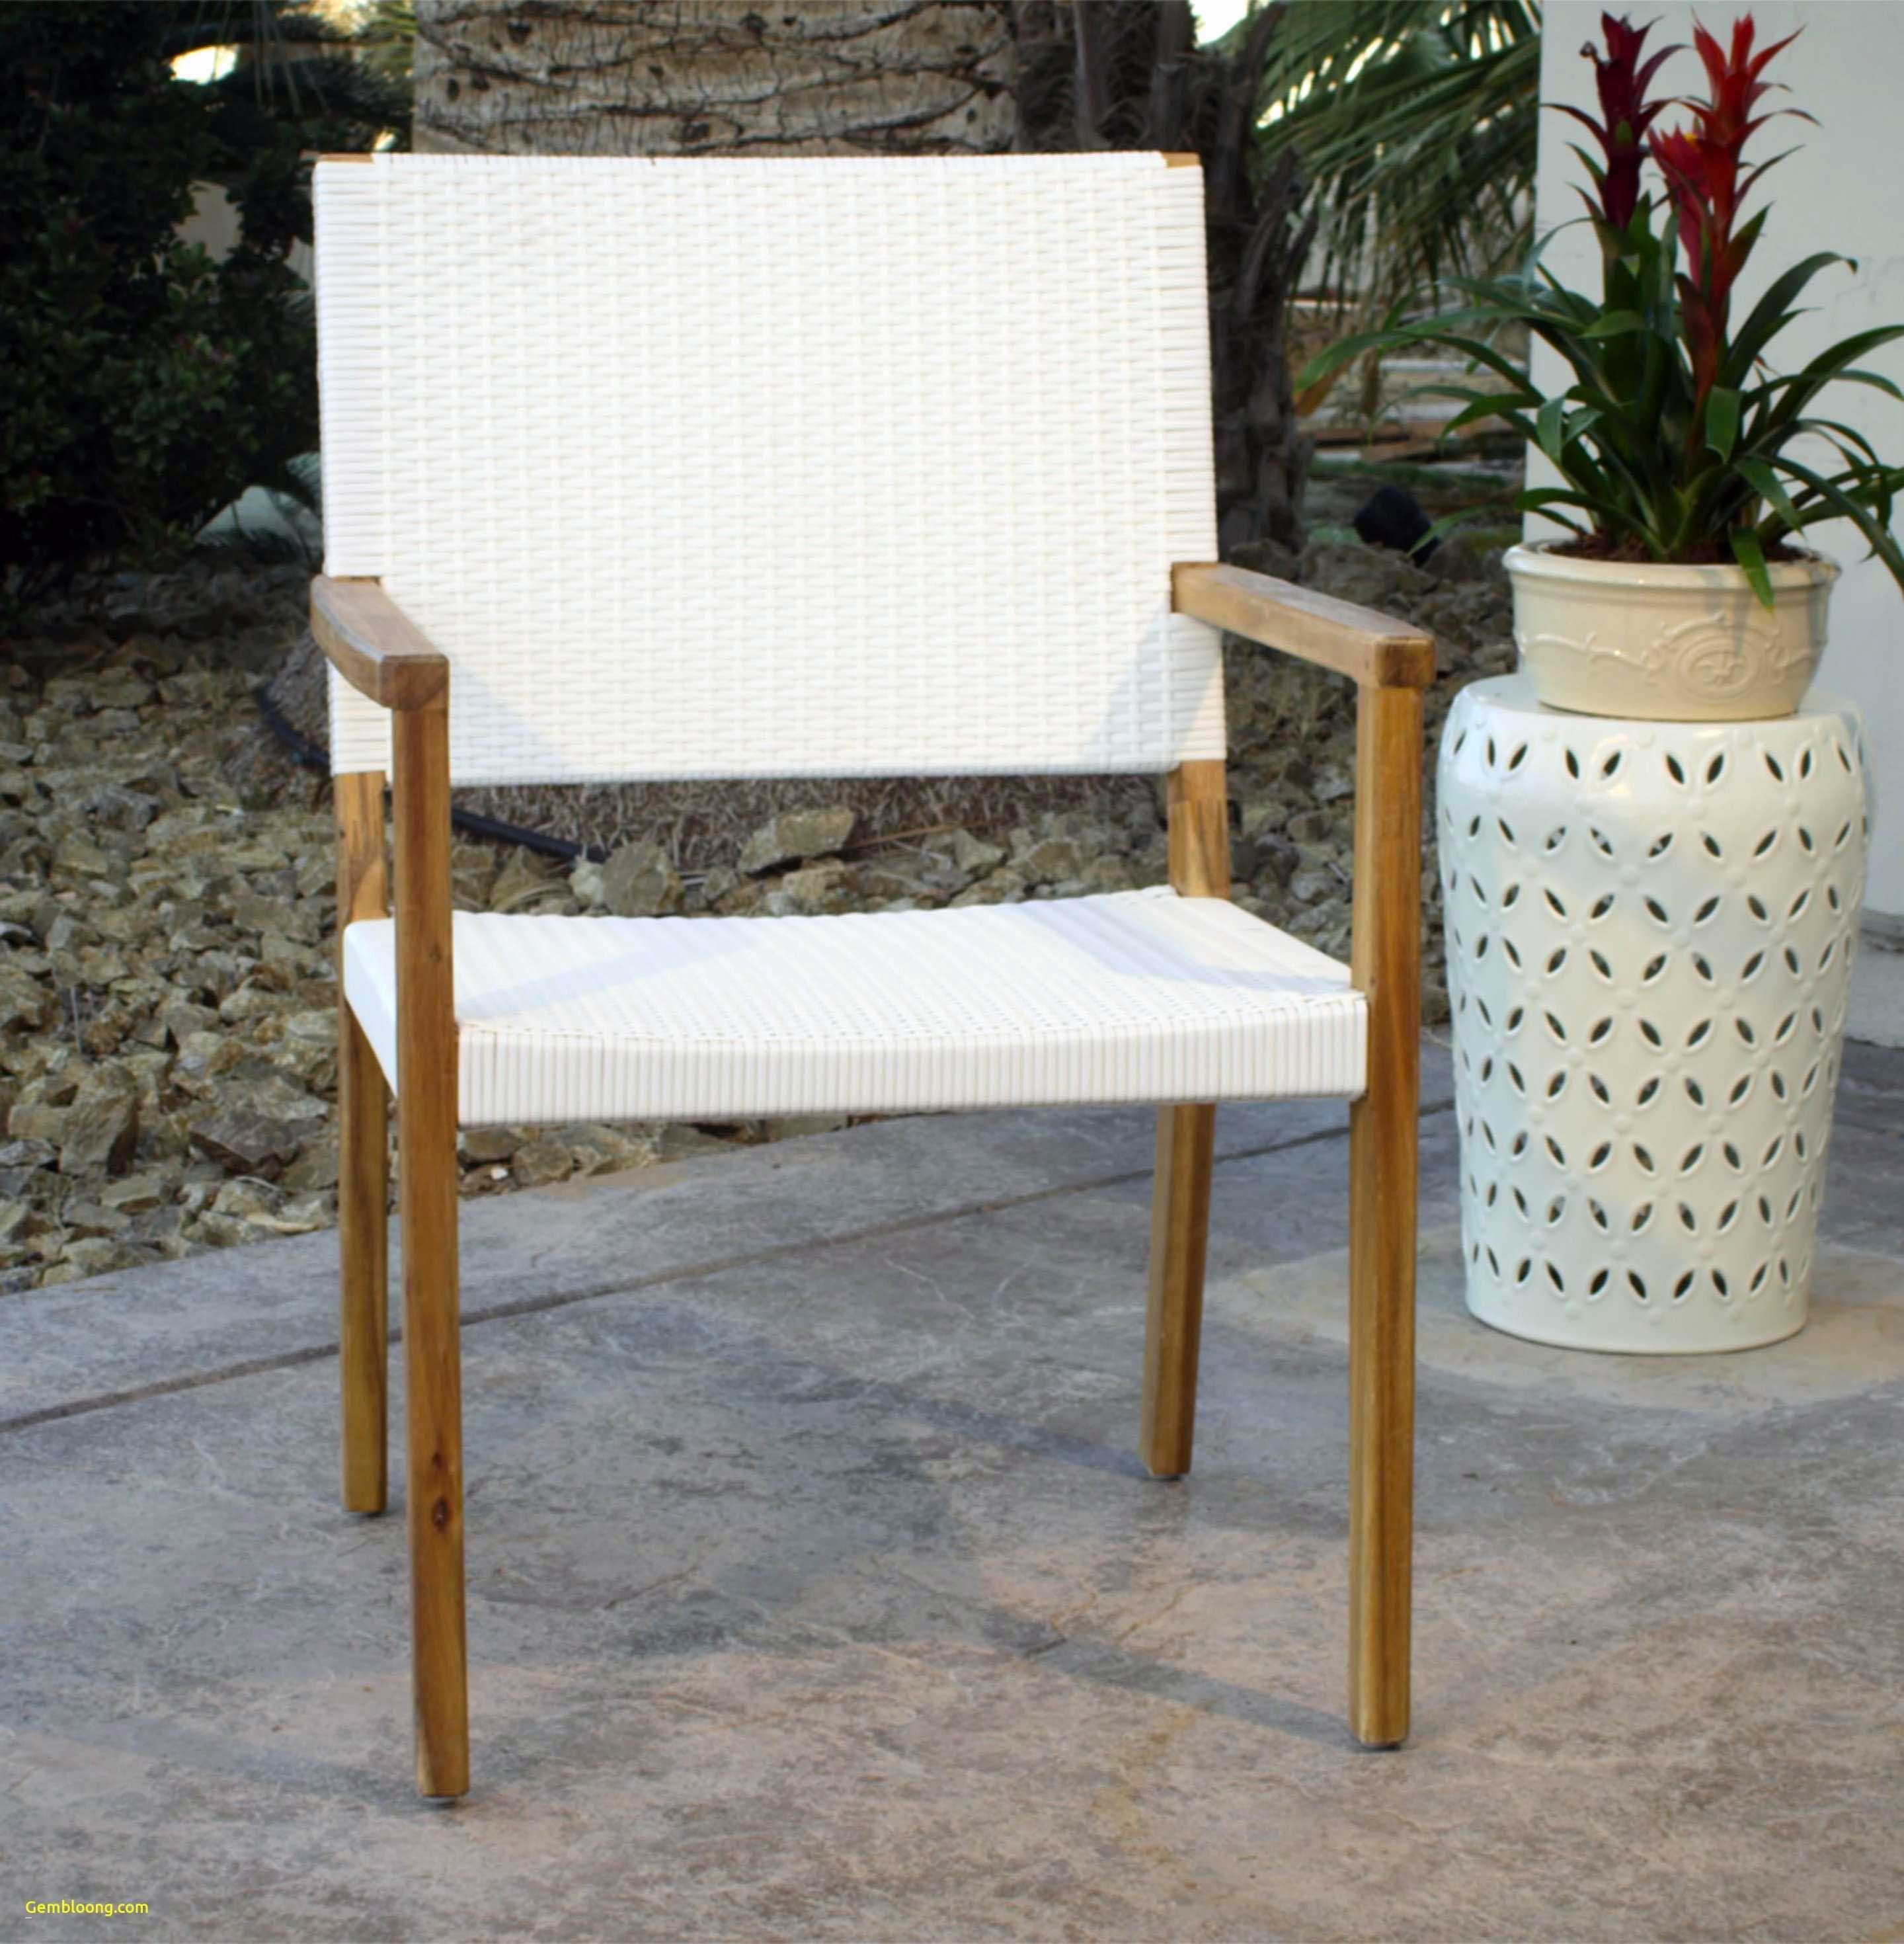 22 Admirable Trek Deck Ideas Wood Patio Furniture Patio Cushions Outdoor Wood Furniture